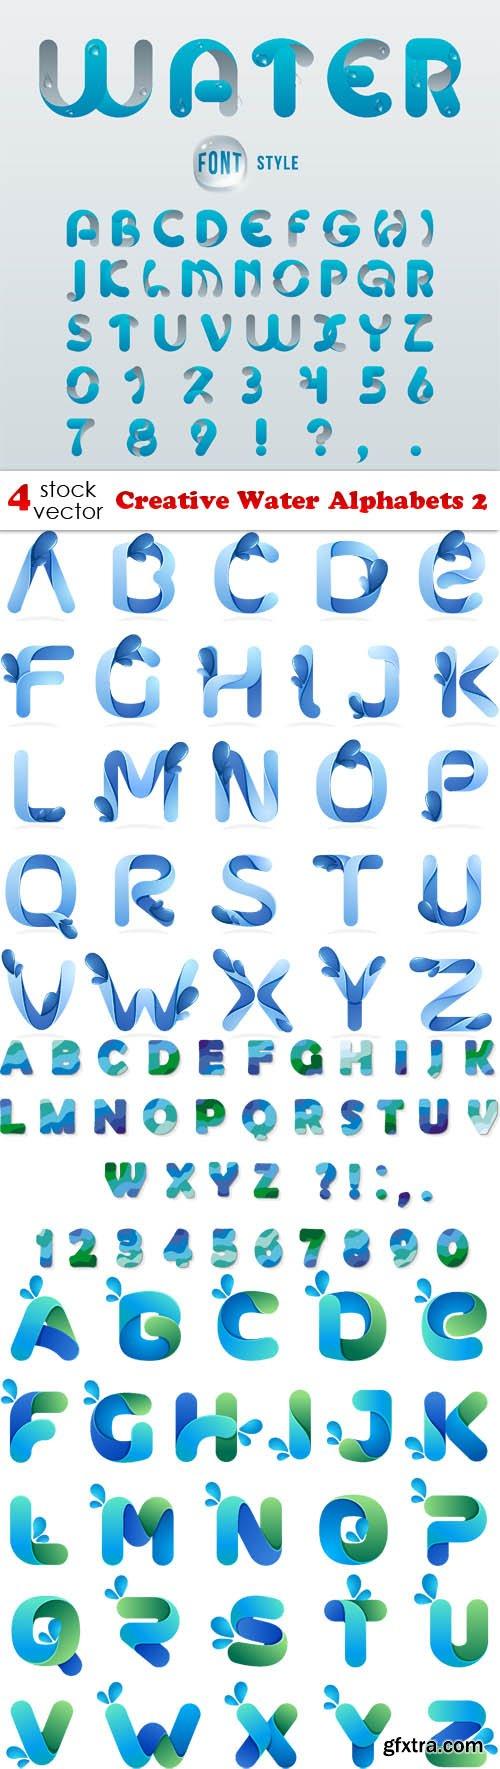 Vectors - Creative Water Alphabets 2